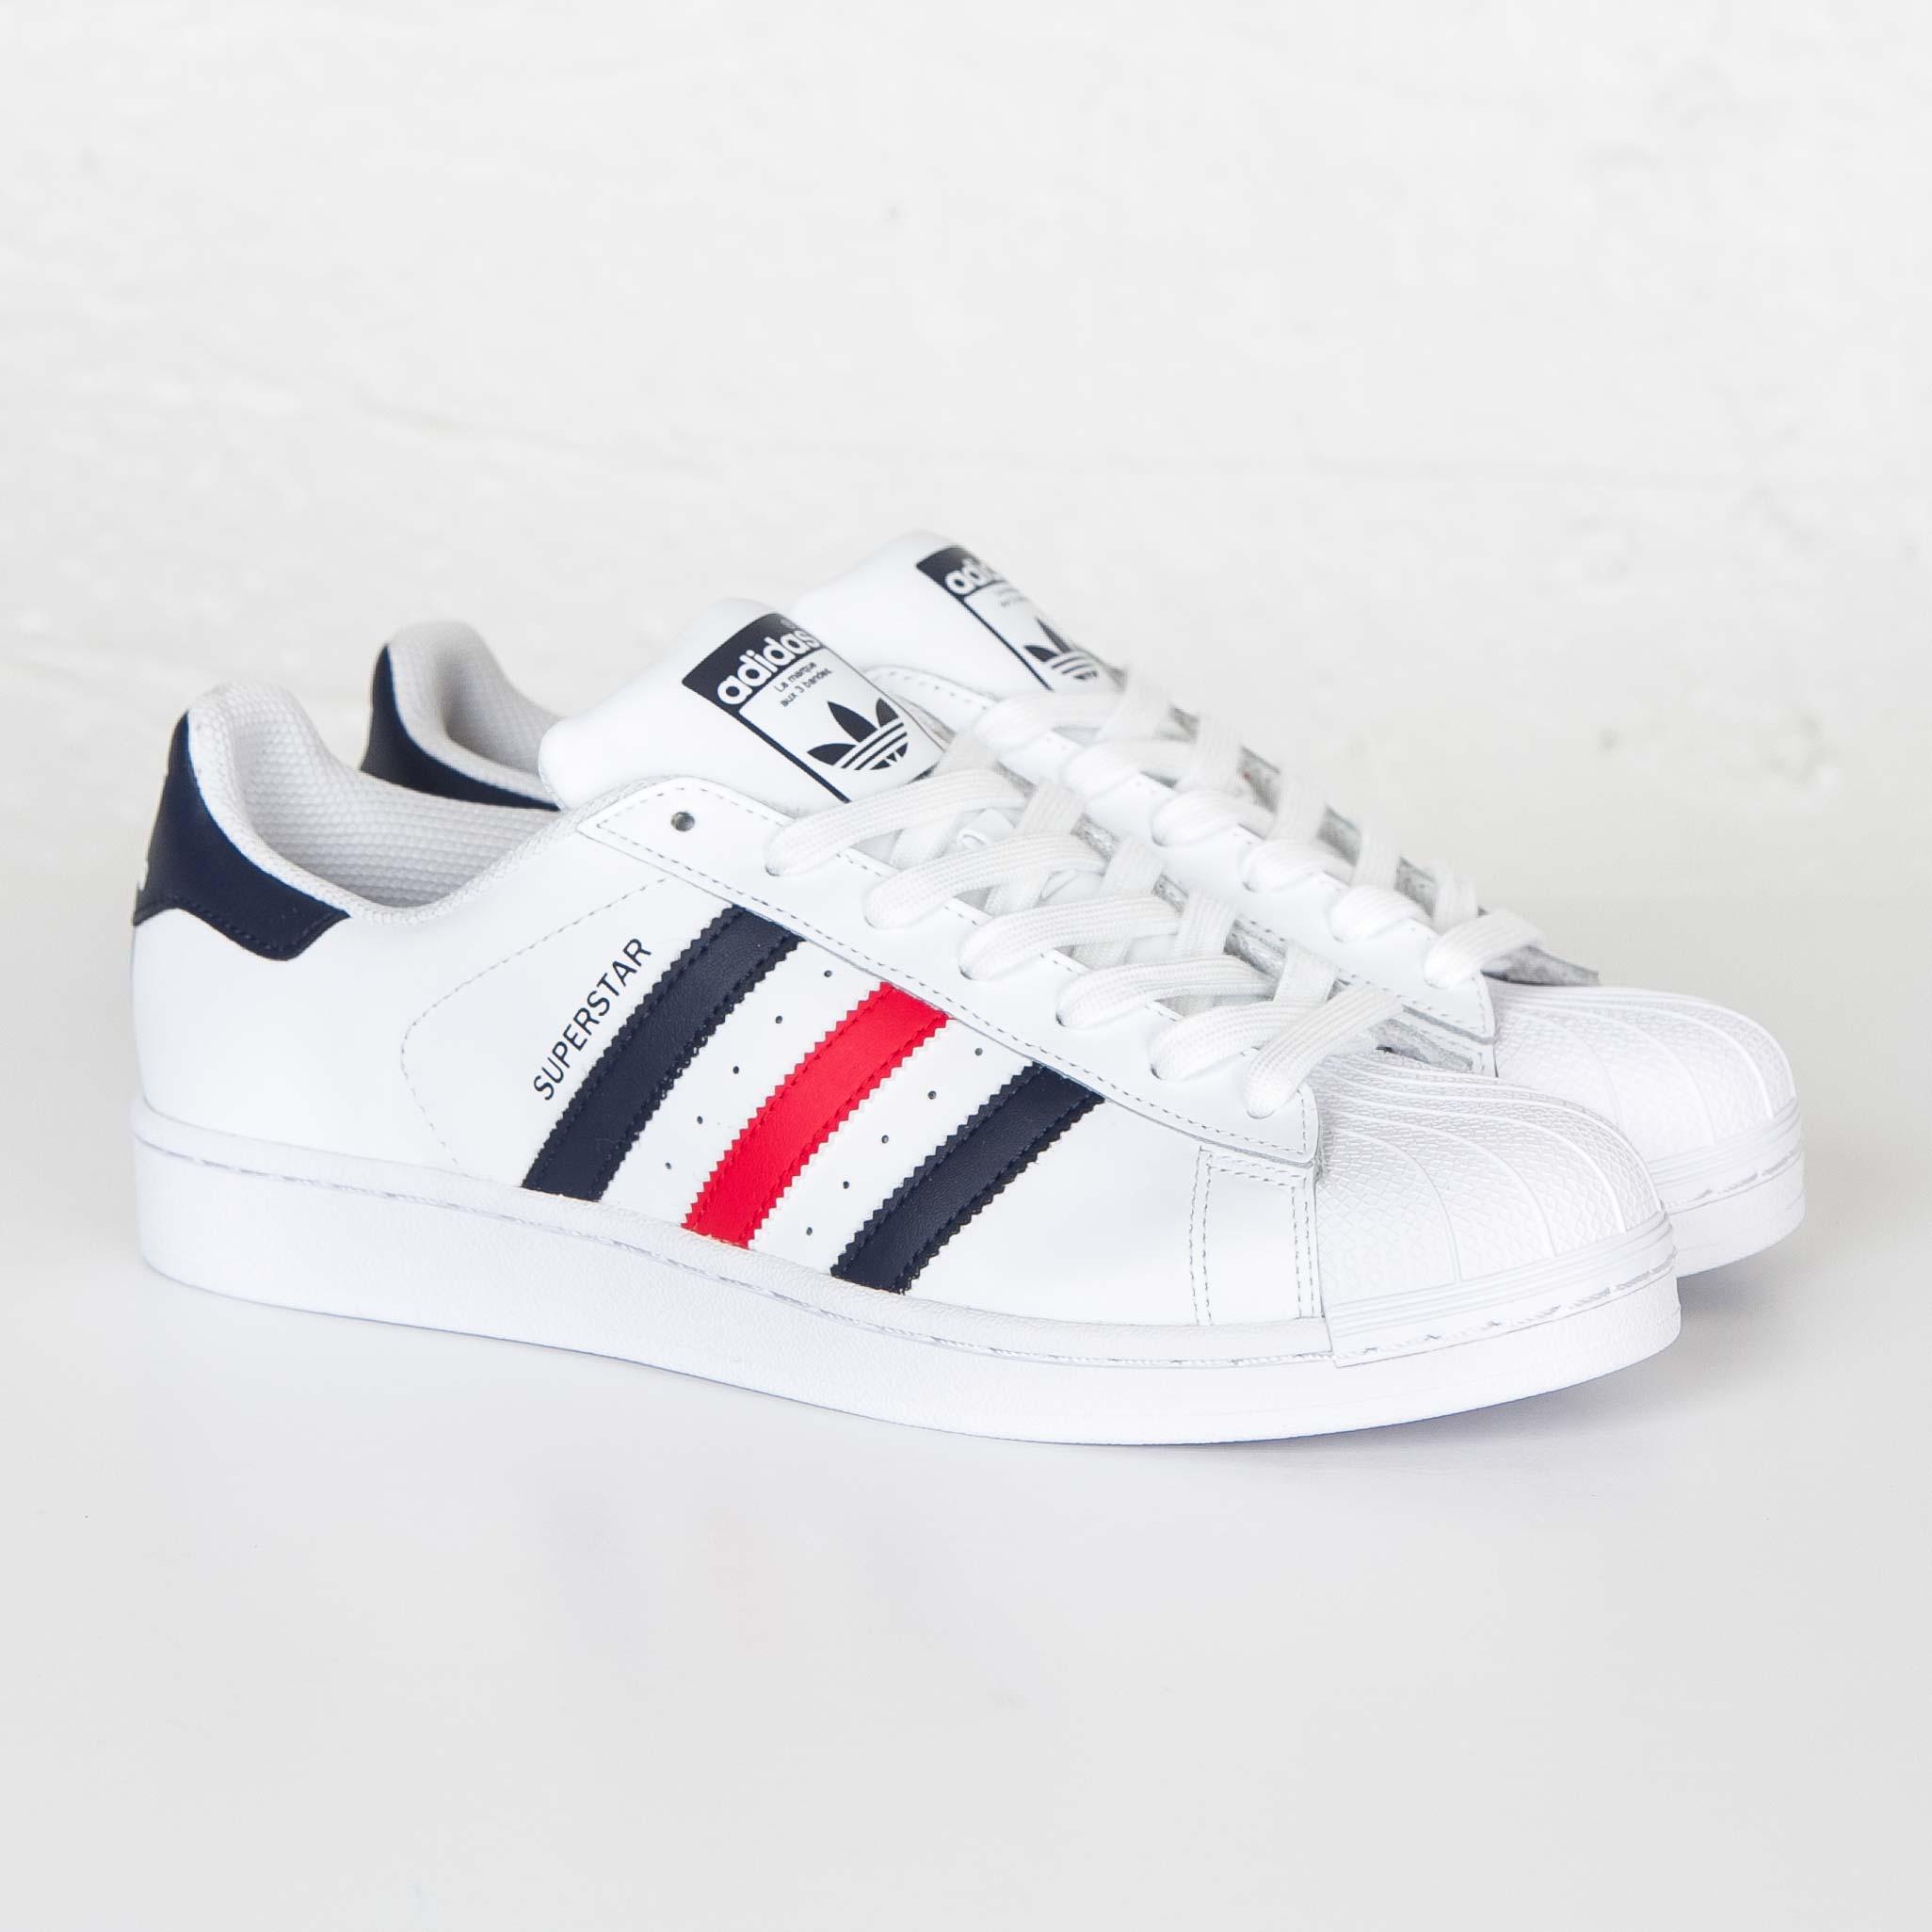 adidas Superstar Foundation - S79208 - SNS | sneakers & streetwear ...